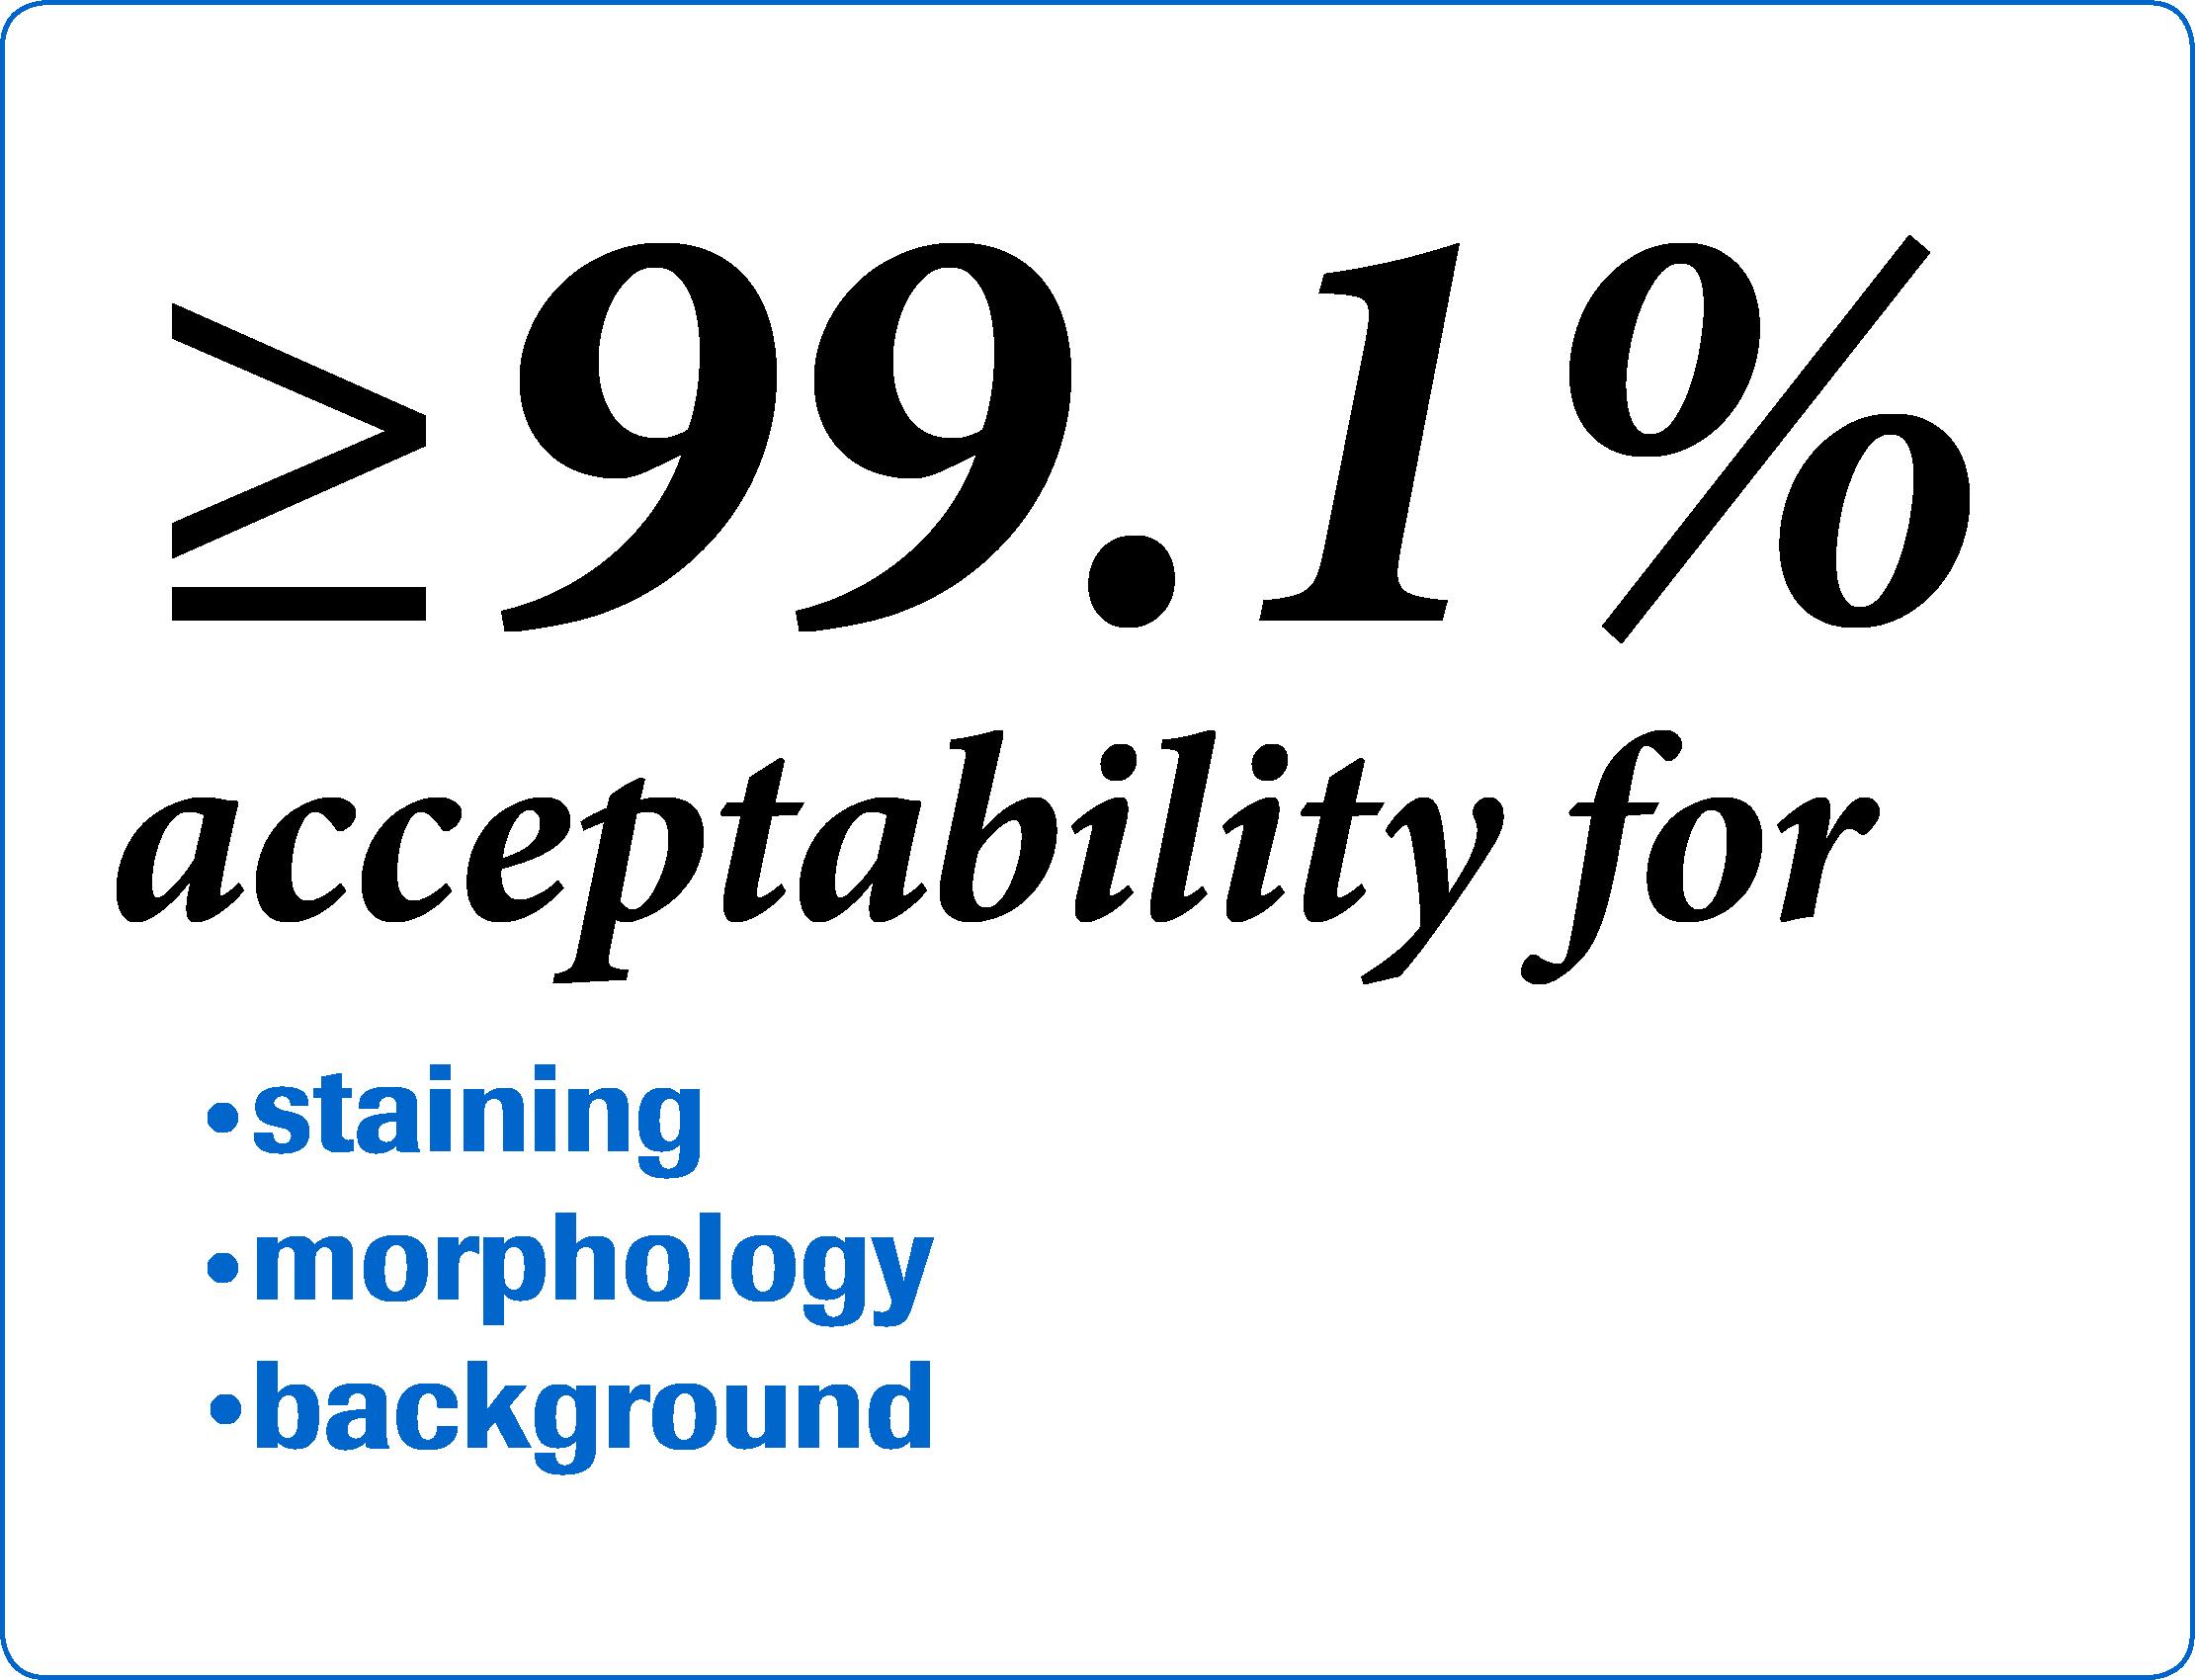 CINtec Histology 99.1% acceptability